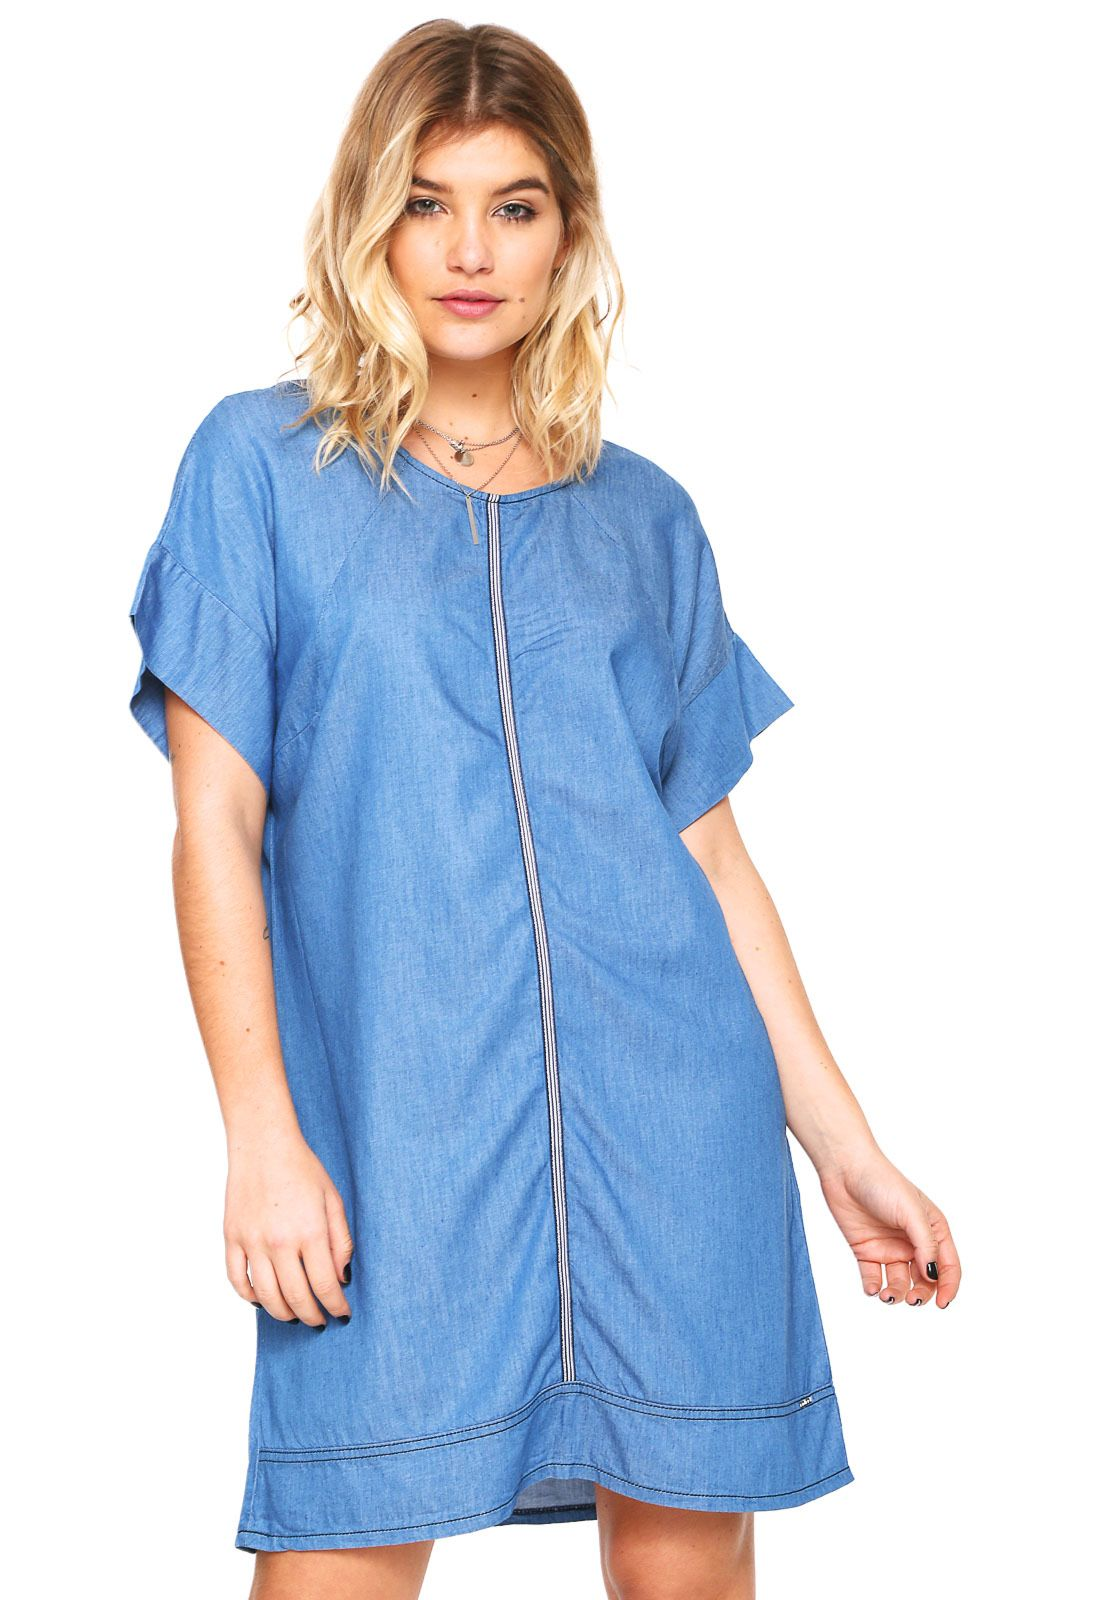 Vestido colcci curto annie azul marinho